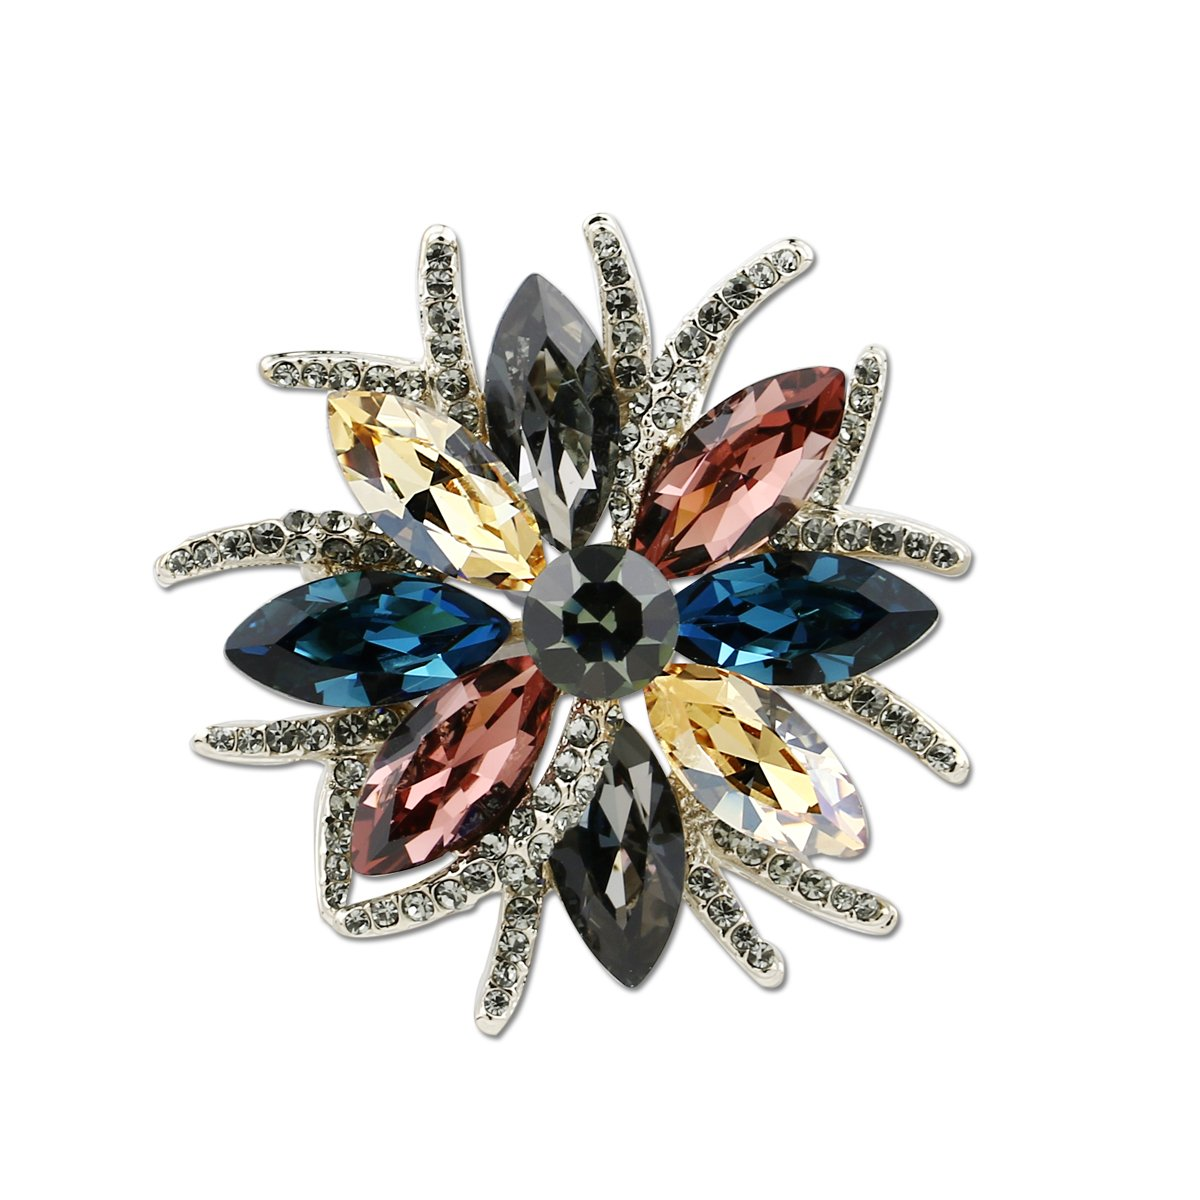 DONGZHOU Womens Wedding Banquet Bouquet Luxury Rhinestone Crystal Brooch Pin Broach